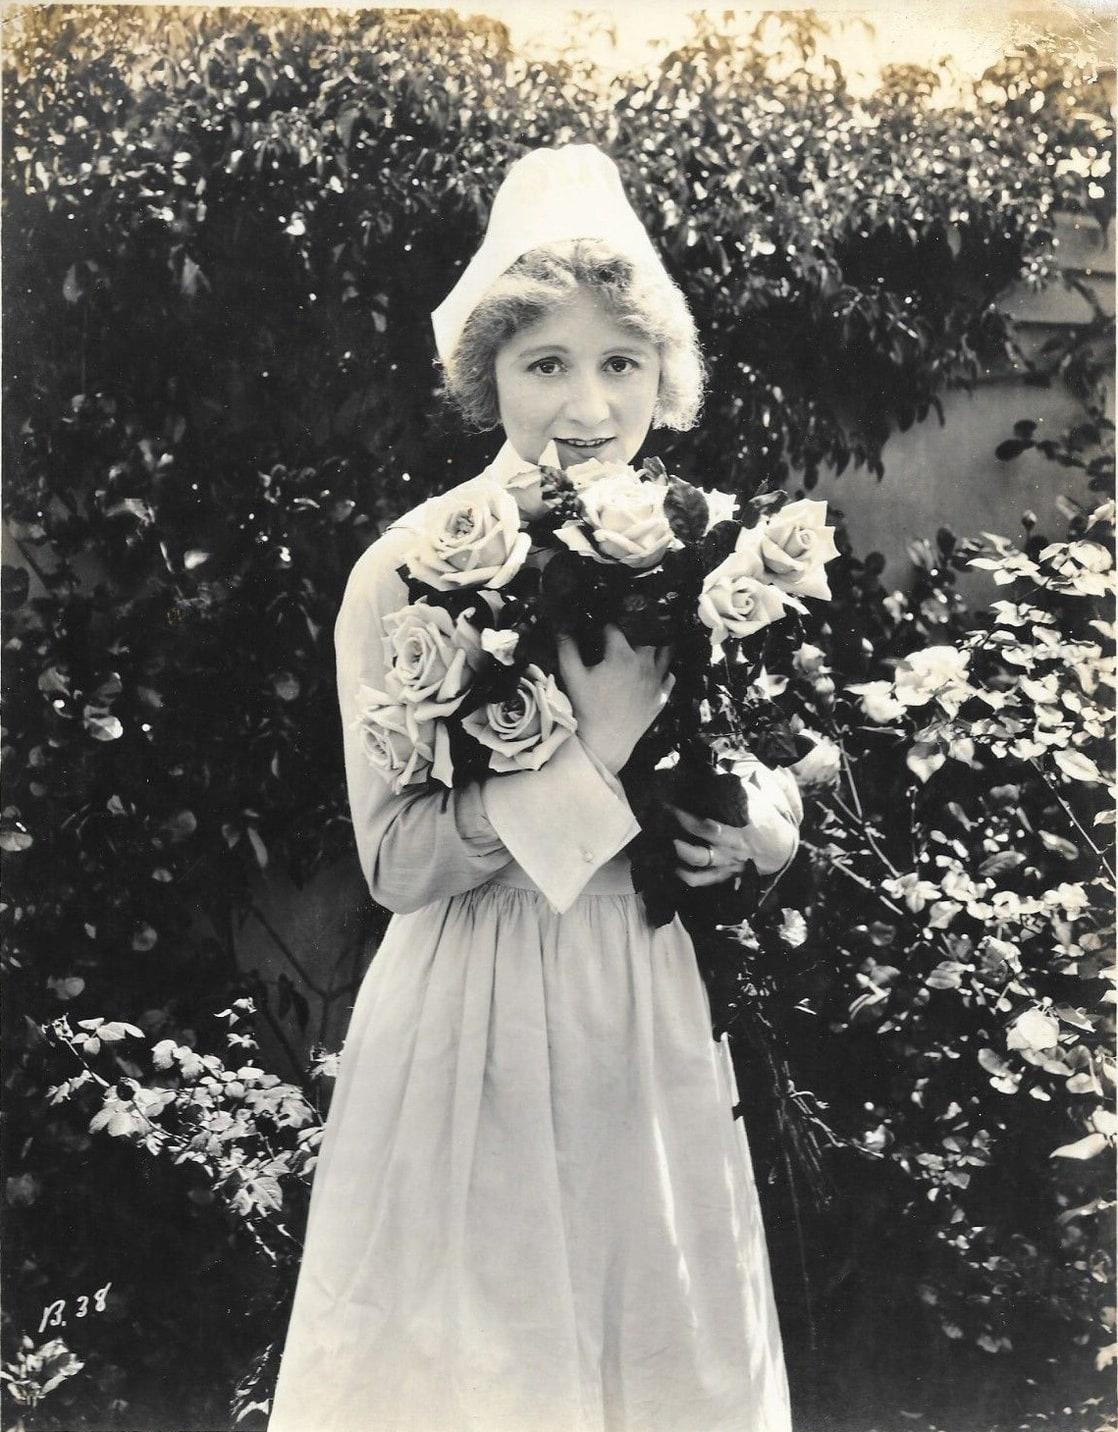 Jennifer Evans,Agot Isidro (b. 1966) Hot pics & movies Rhonda Fleming,Tom Conway (1904?967 (born in St. Petersburg, Russia)